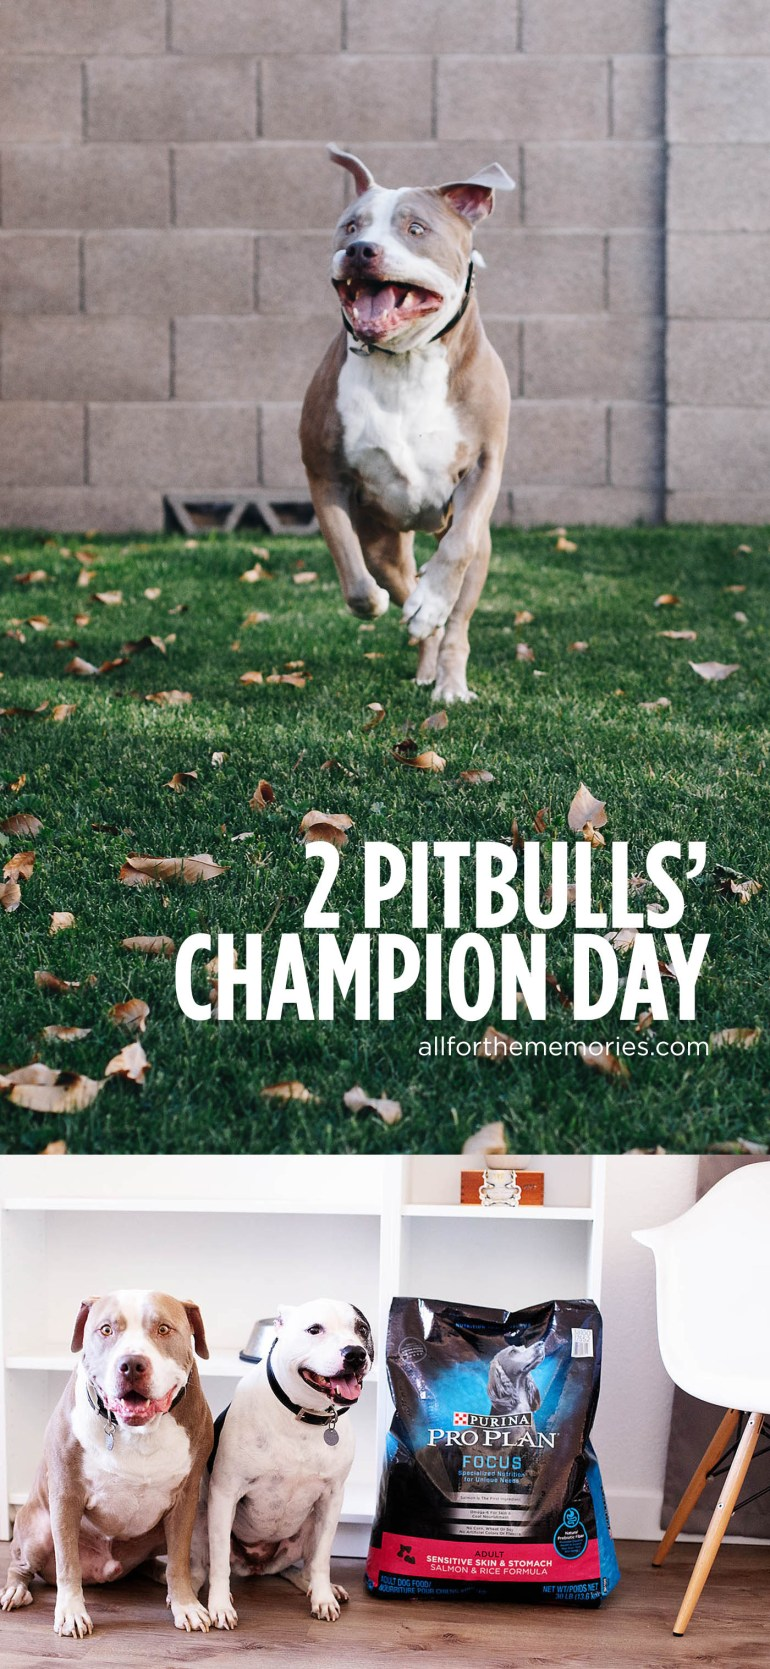 2 pitbulls' idea of a champion day